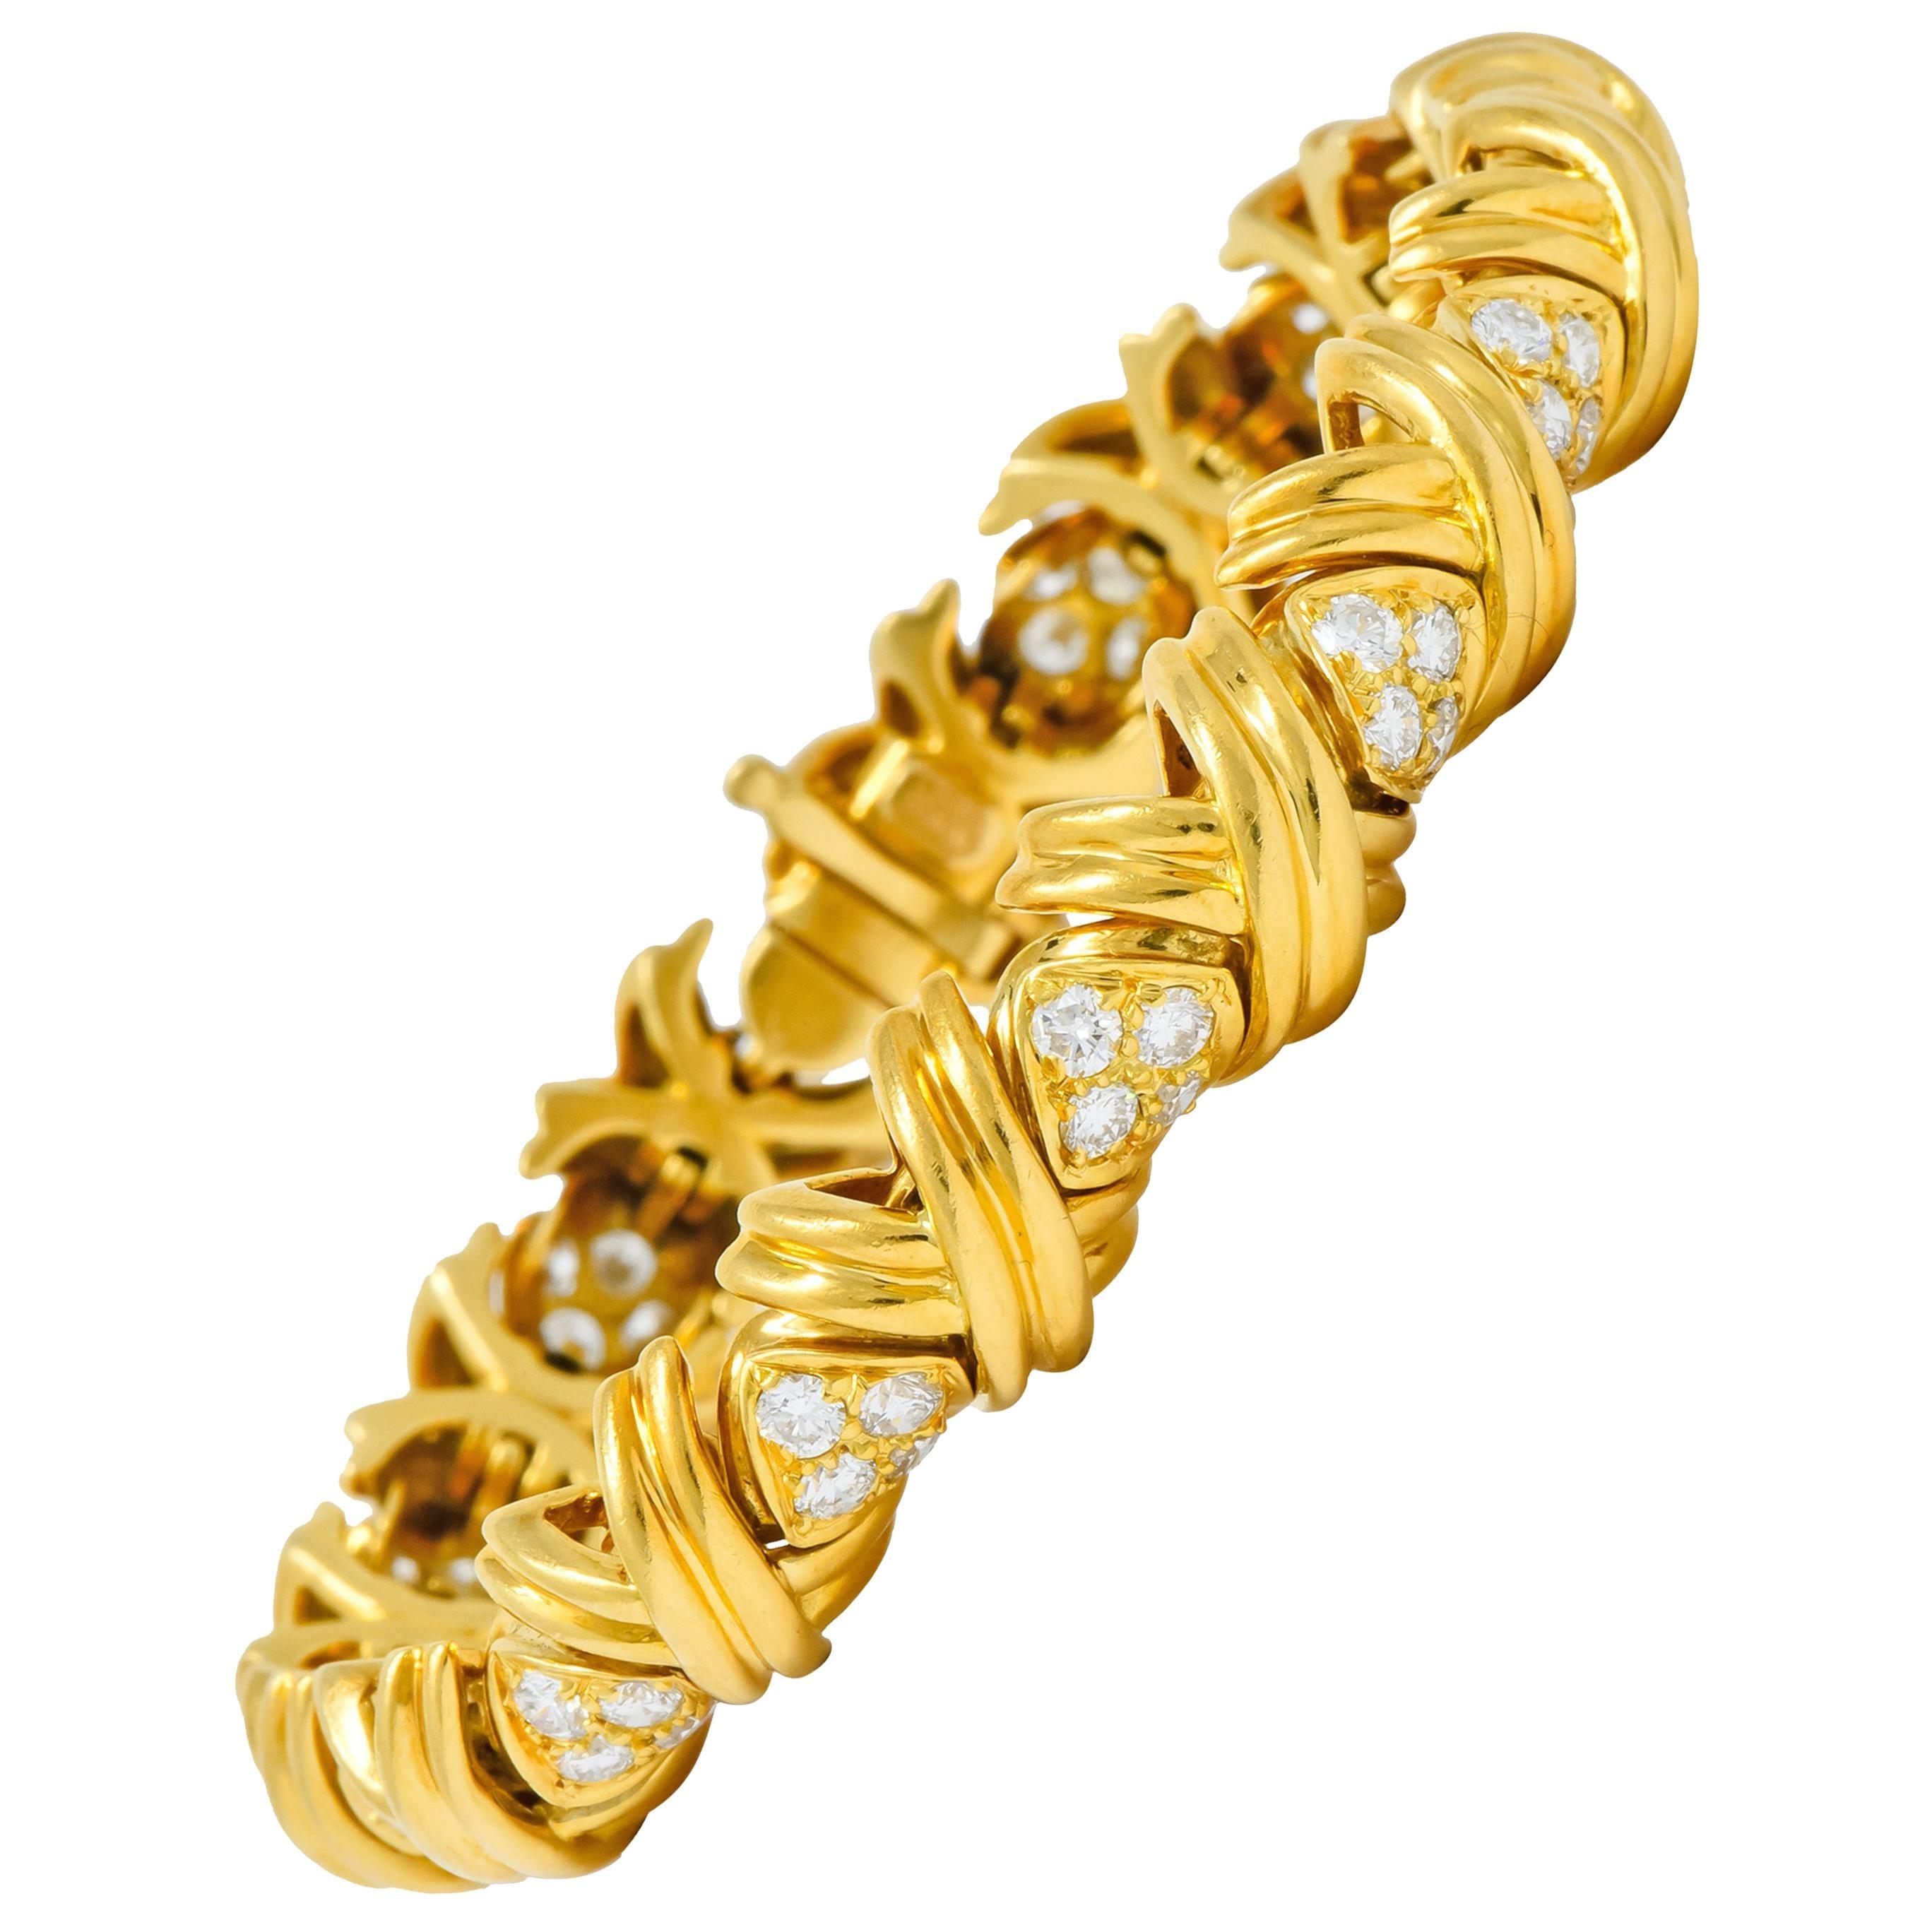 Tiffany & Co. 3.92 Carat Diamond 18 Karat Yellow Gold Signature X Link Bracelet